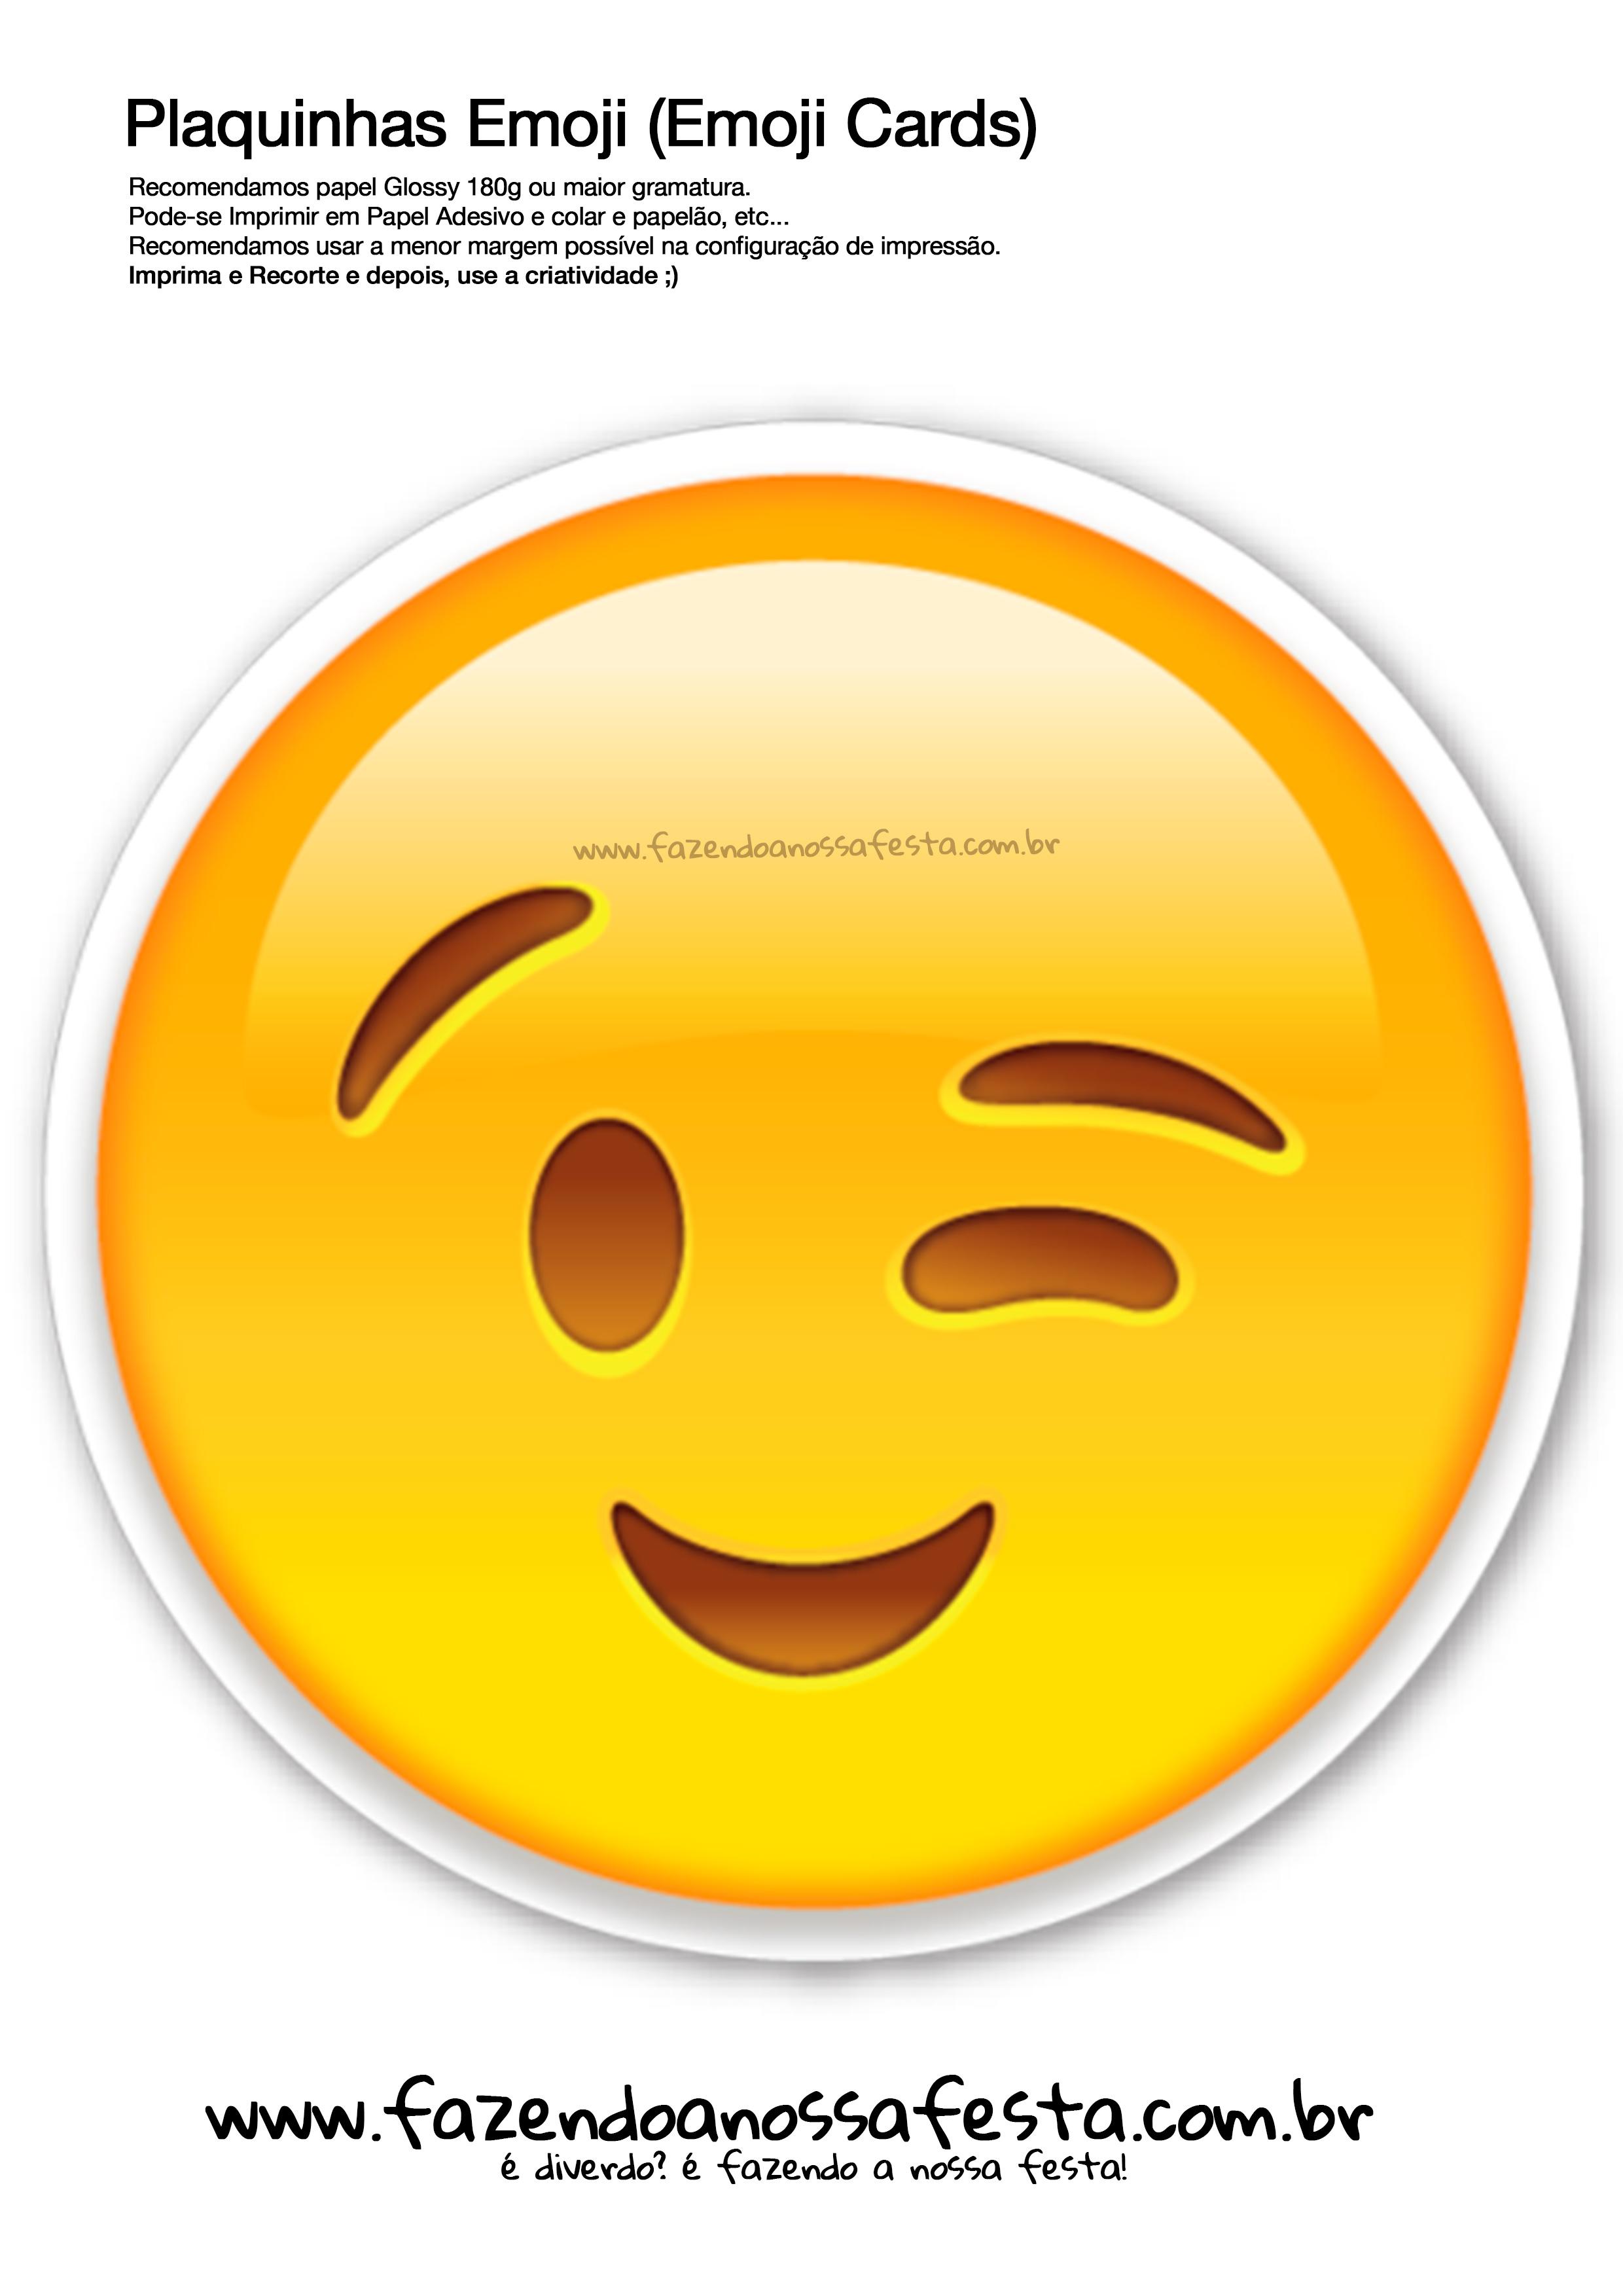 193 Gua Emoji Wpp Png